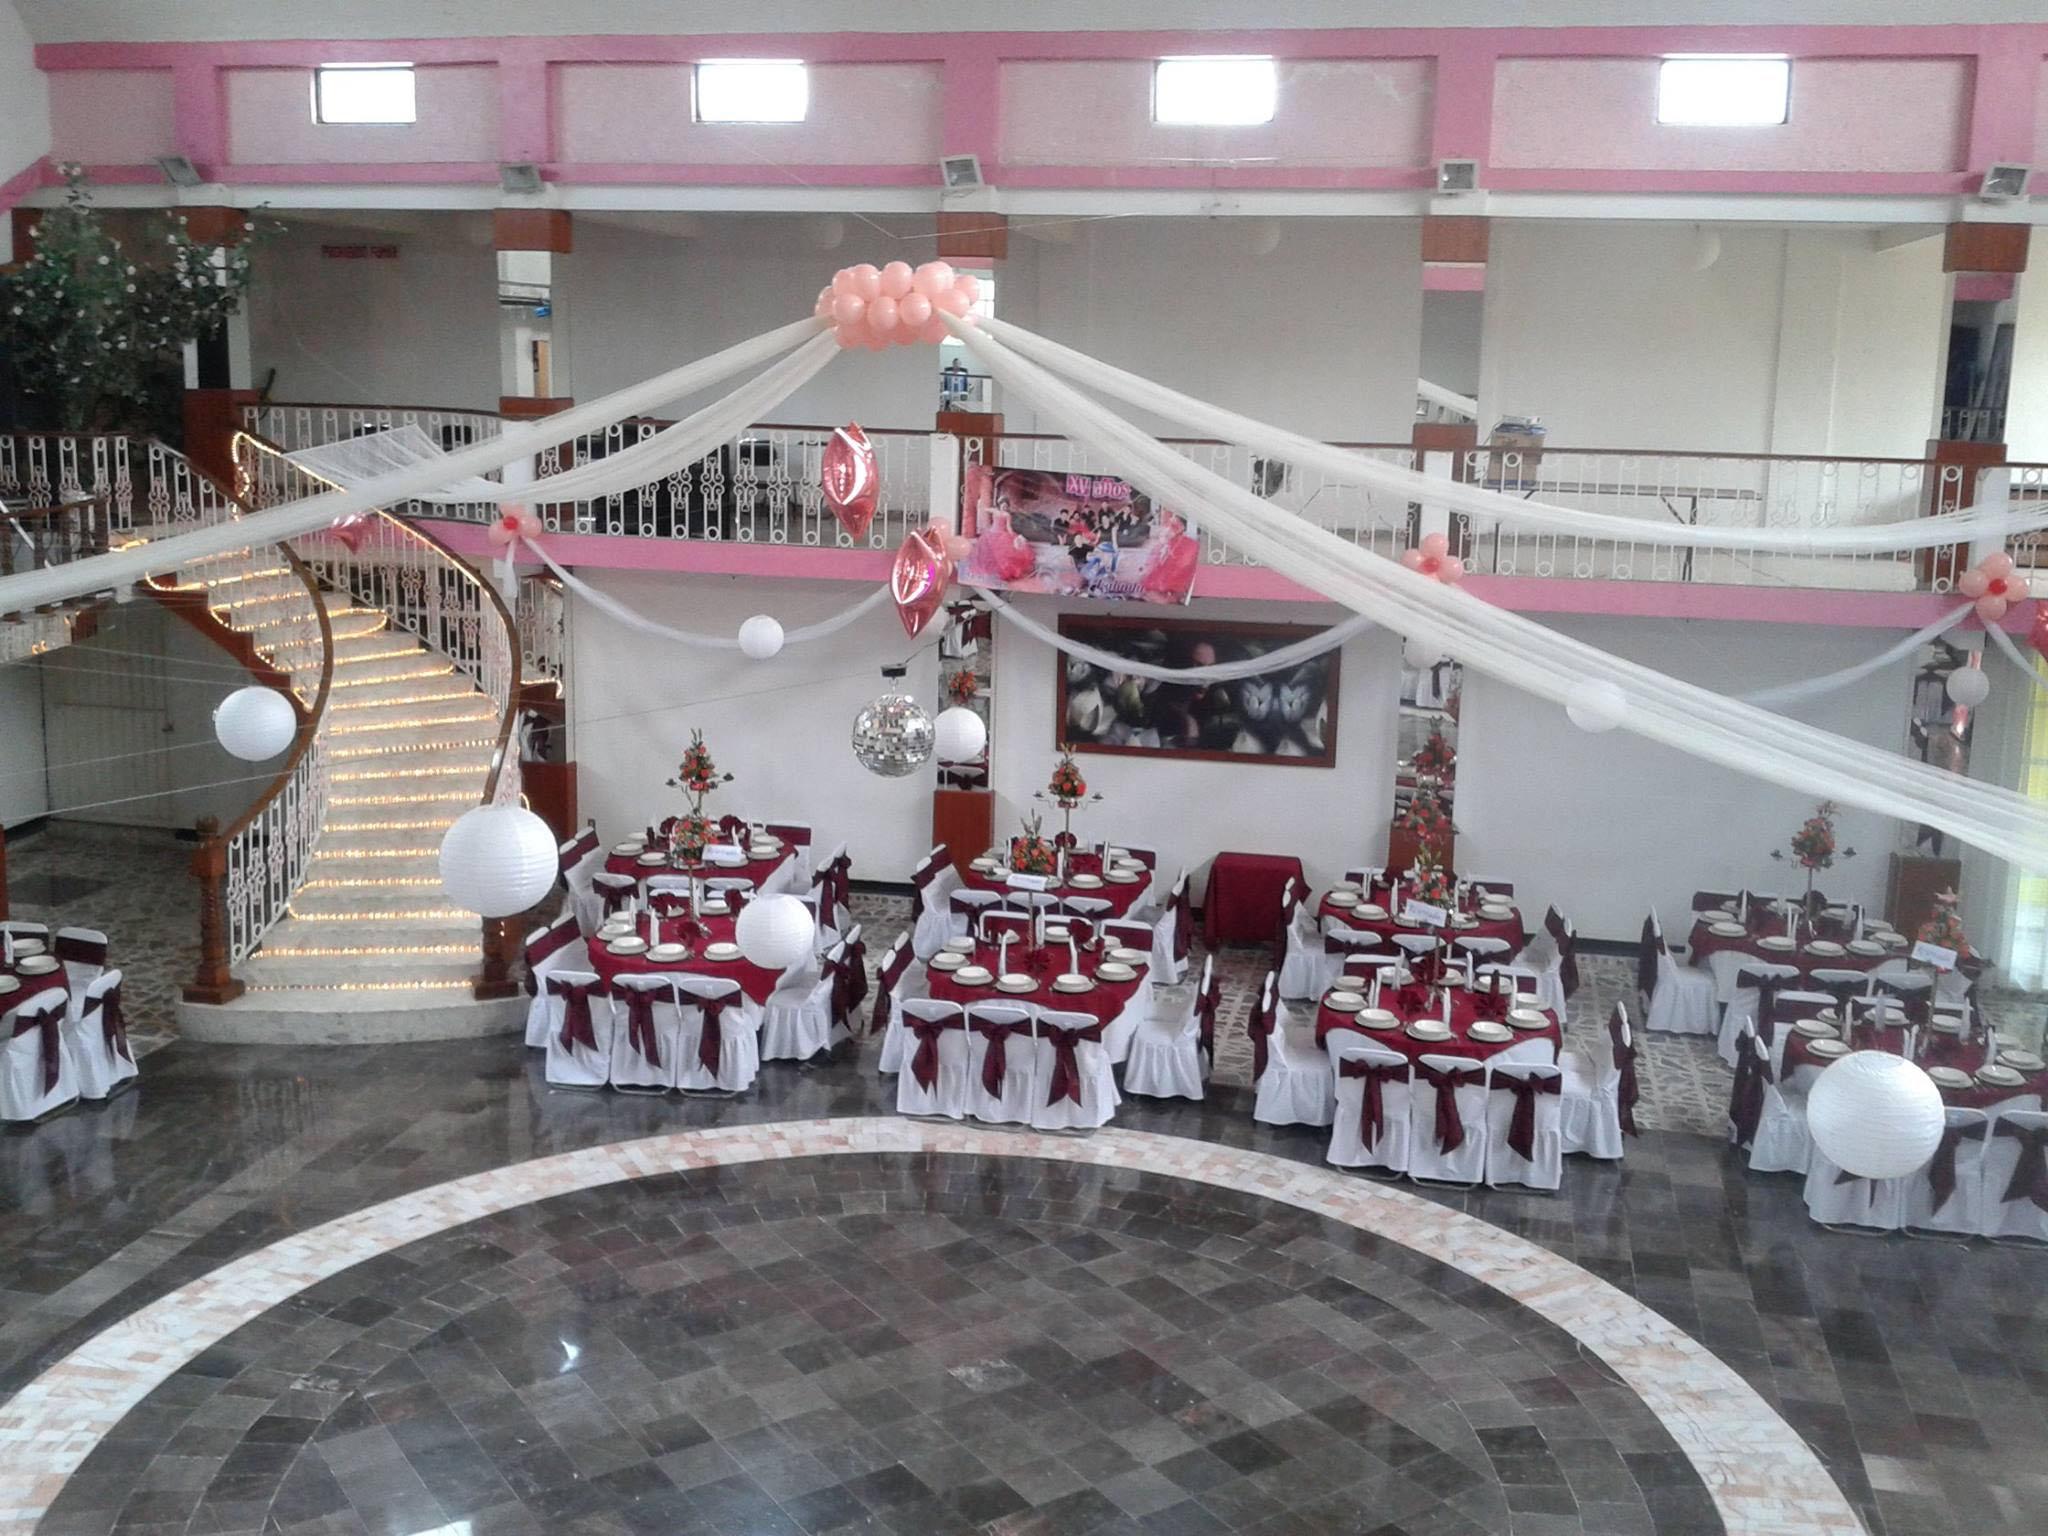 Salon villa flores xochimilco salones para eventos for Jardin xochimilco mexicali